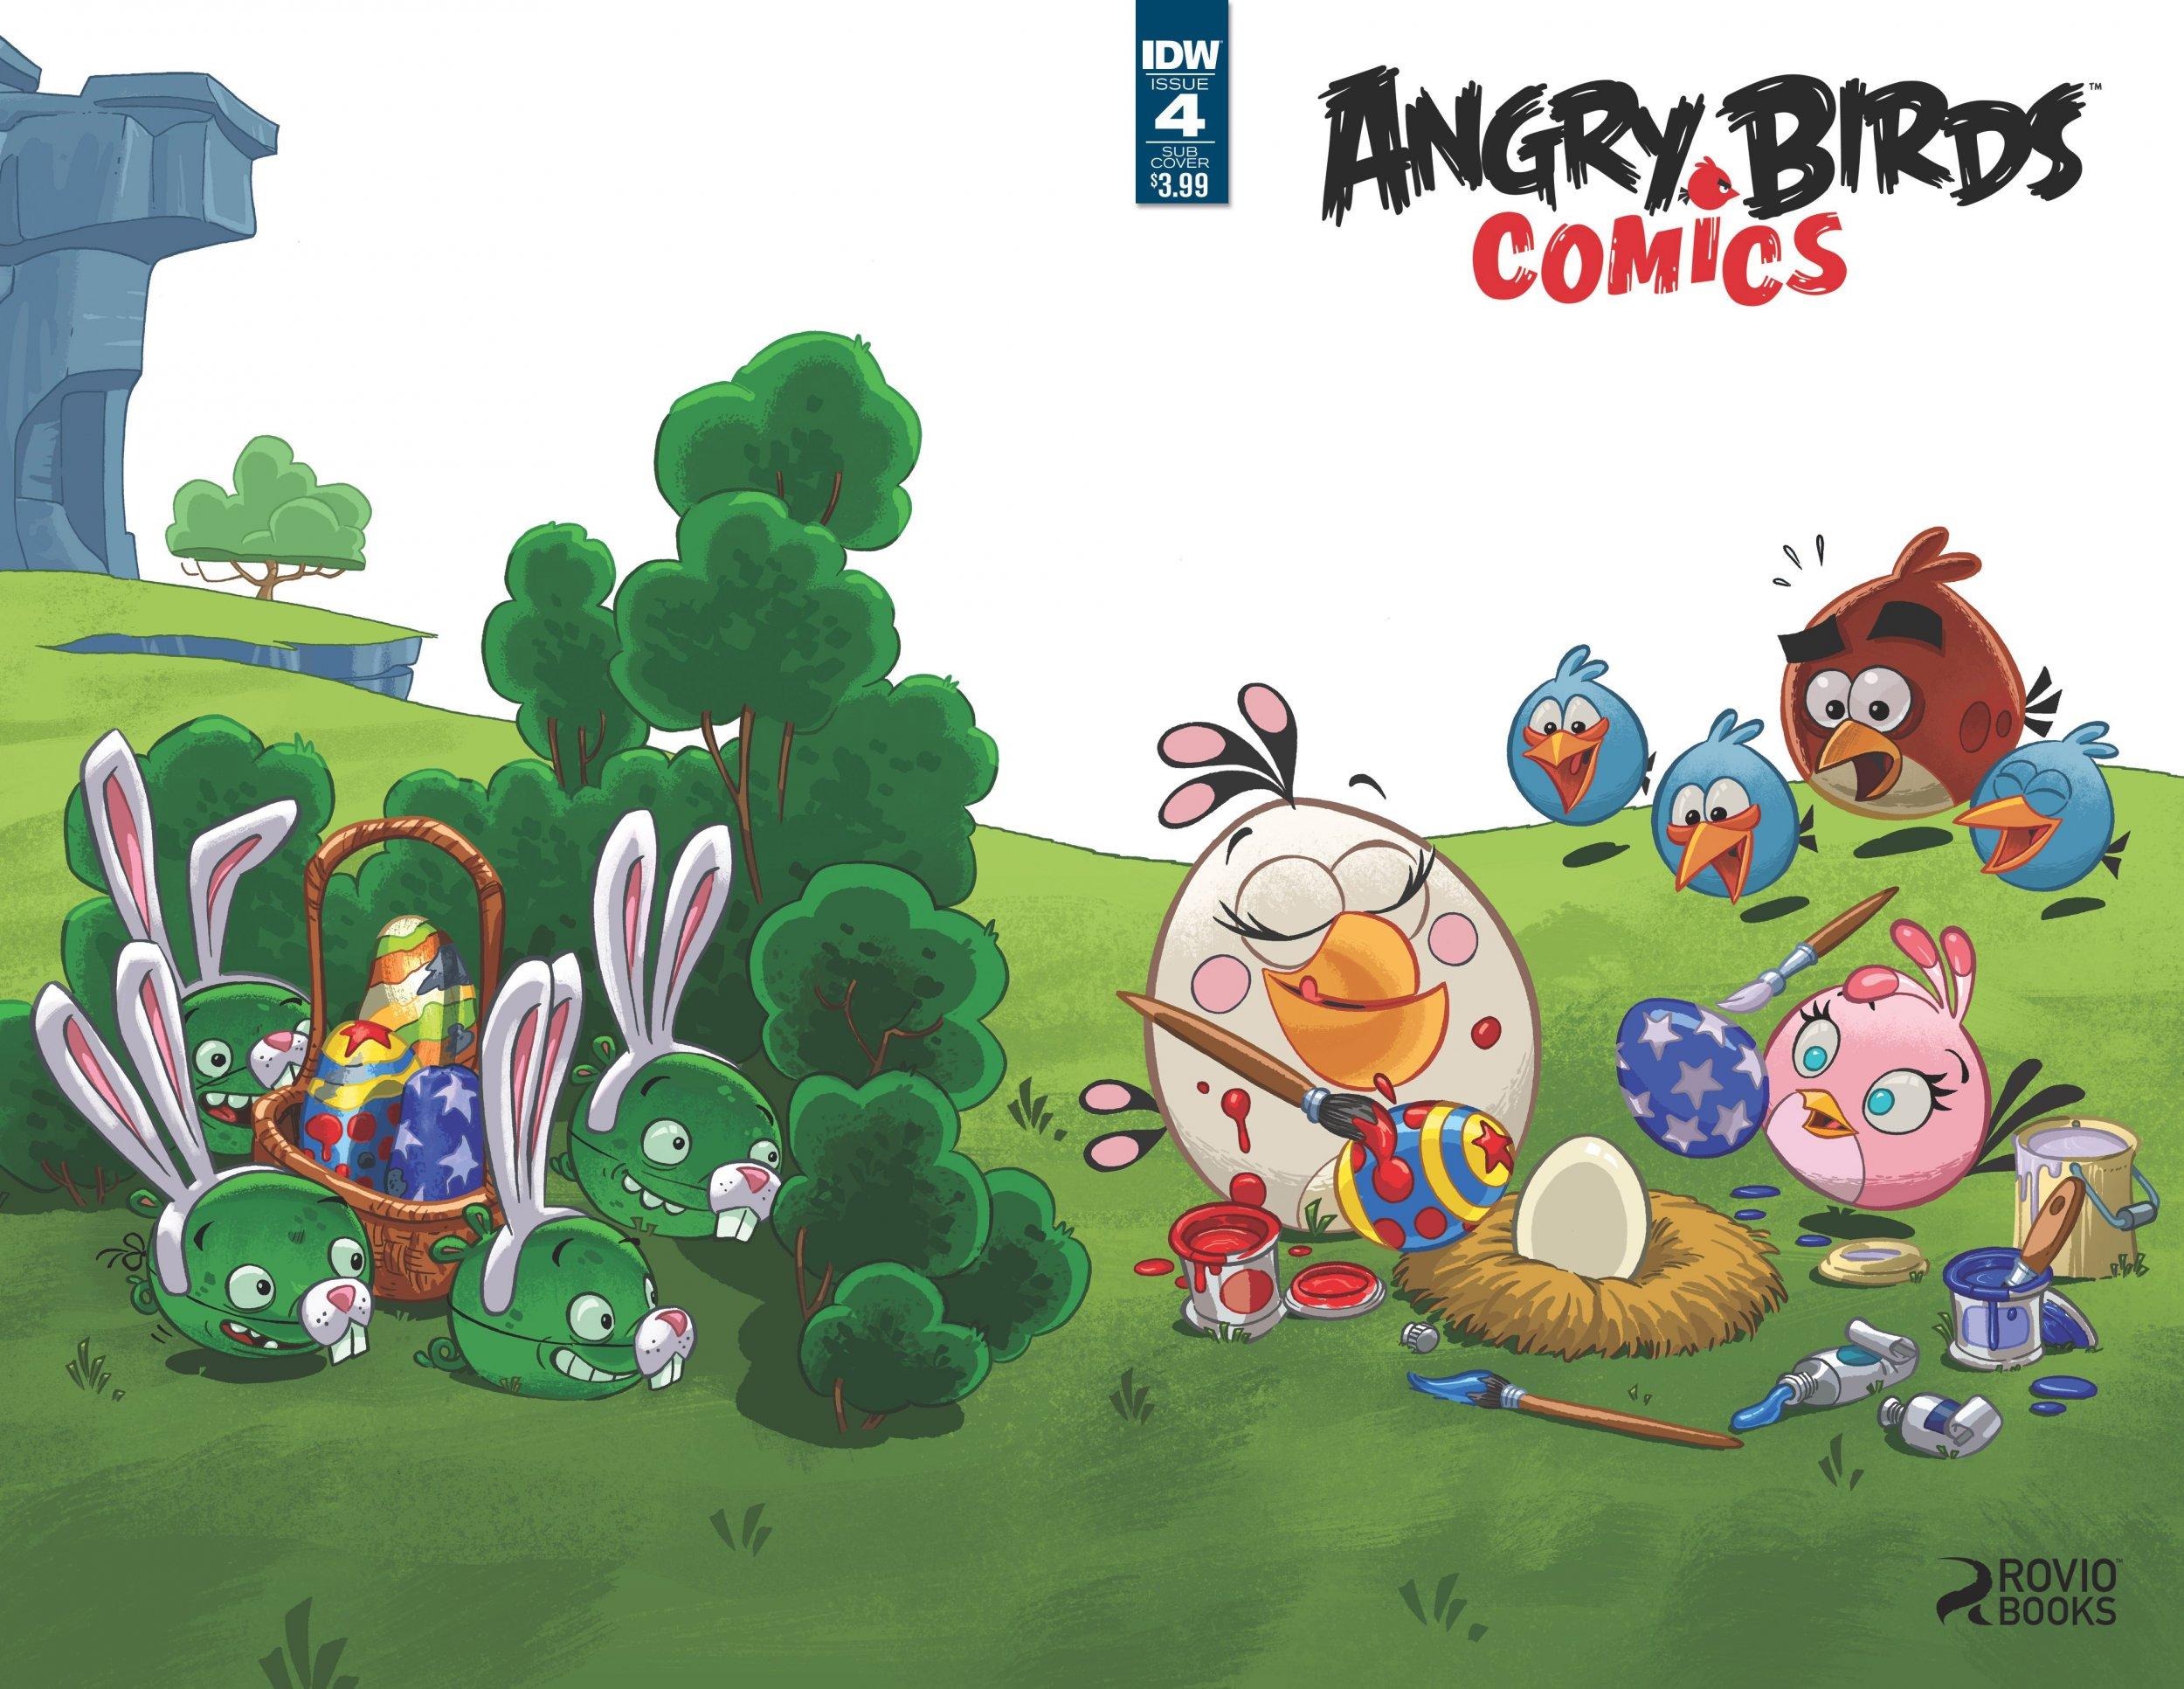 Angry Birds Comics Vol.2 004 (April 2016) (subscriber cover)